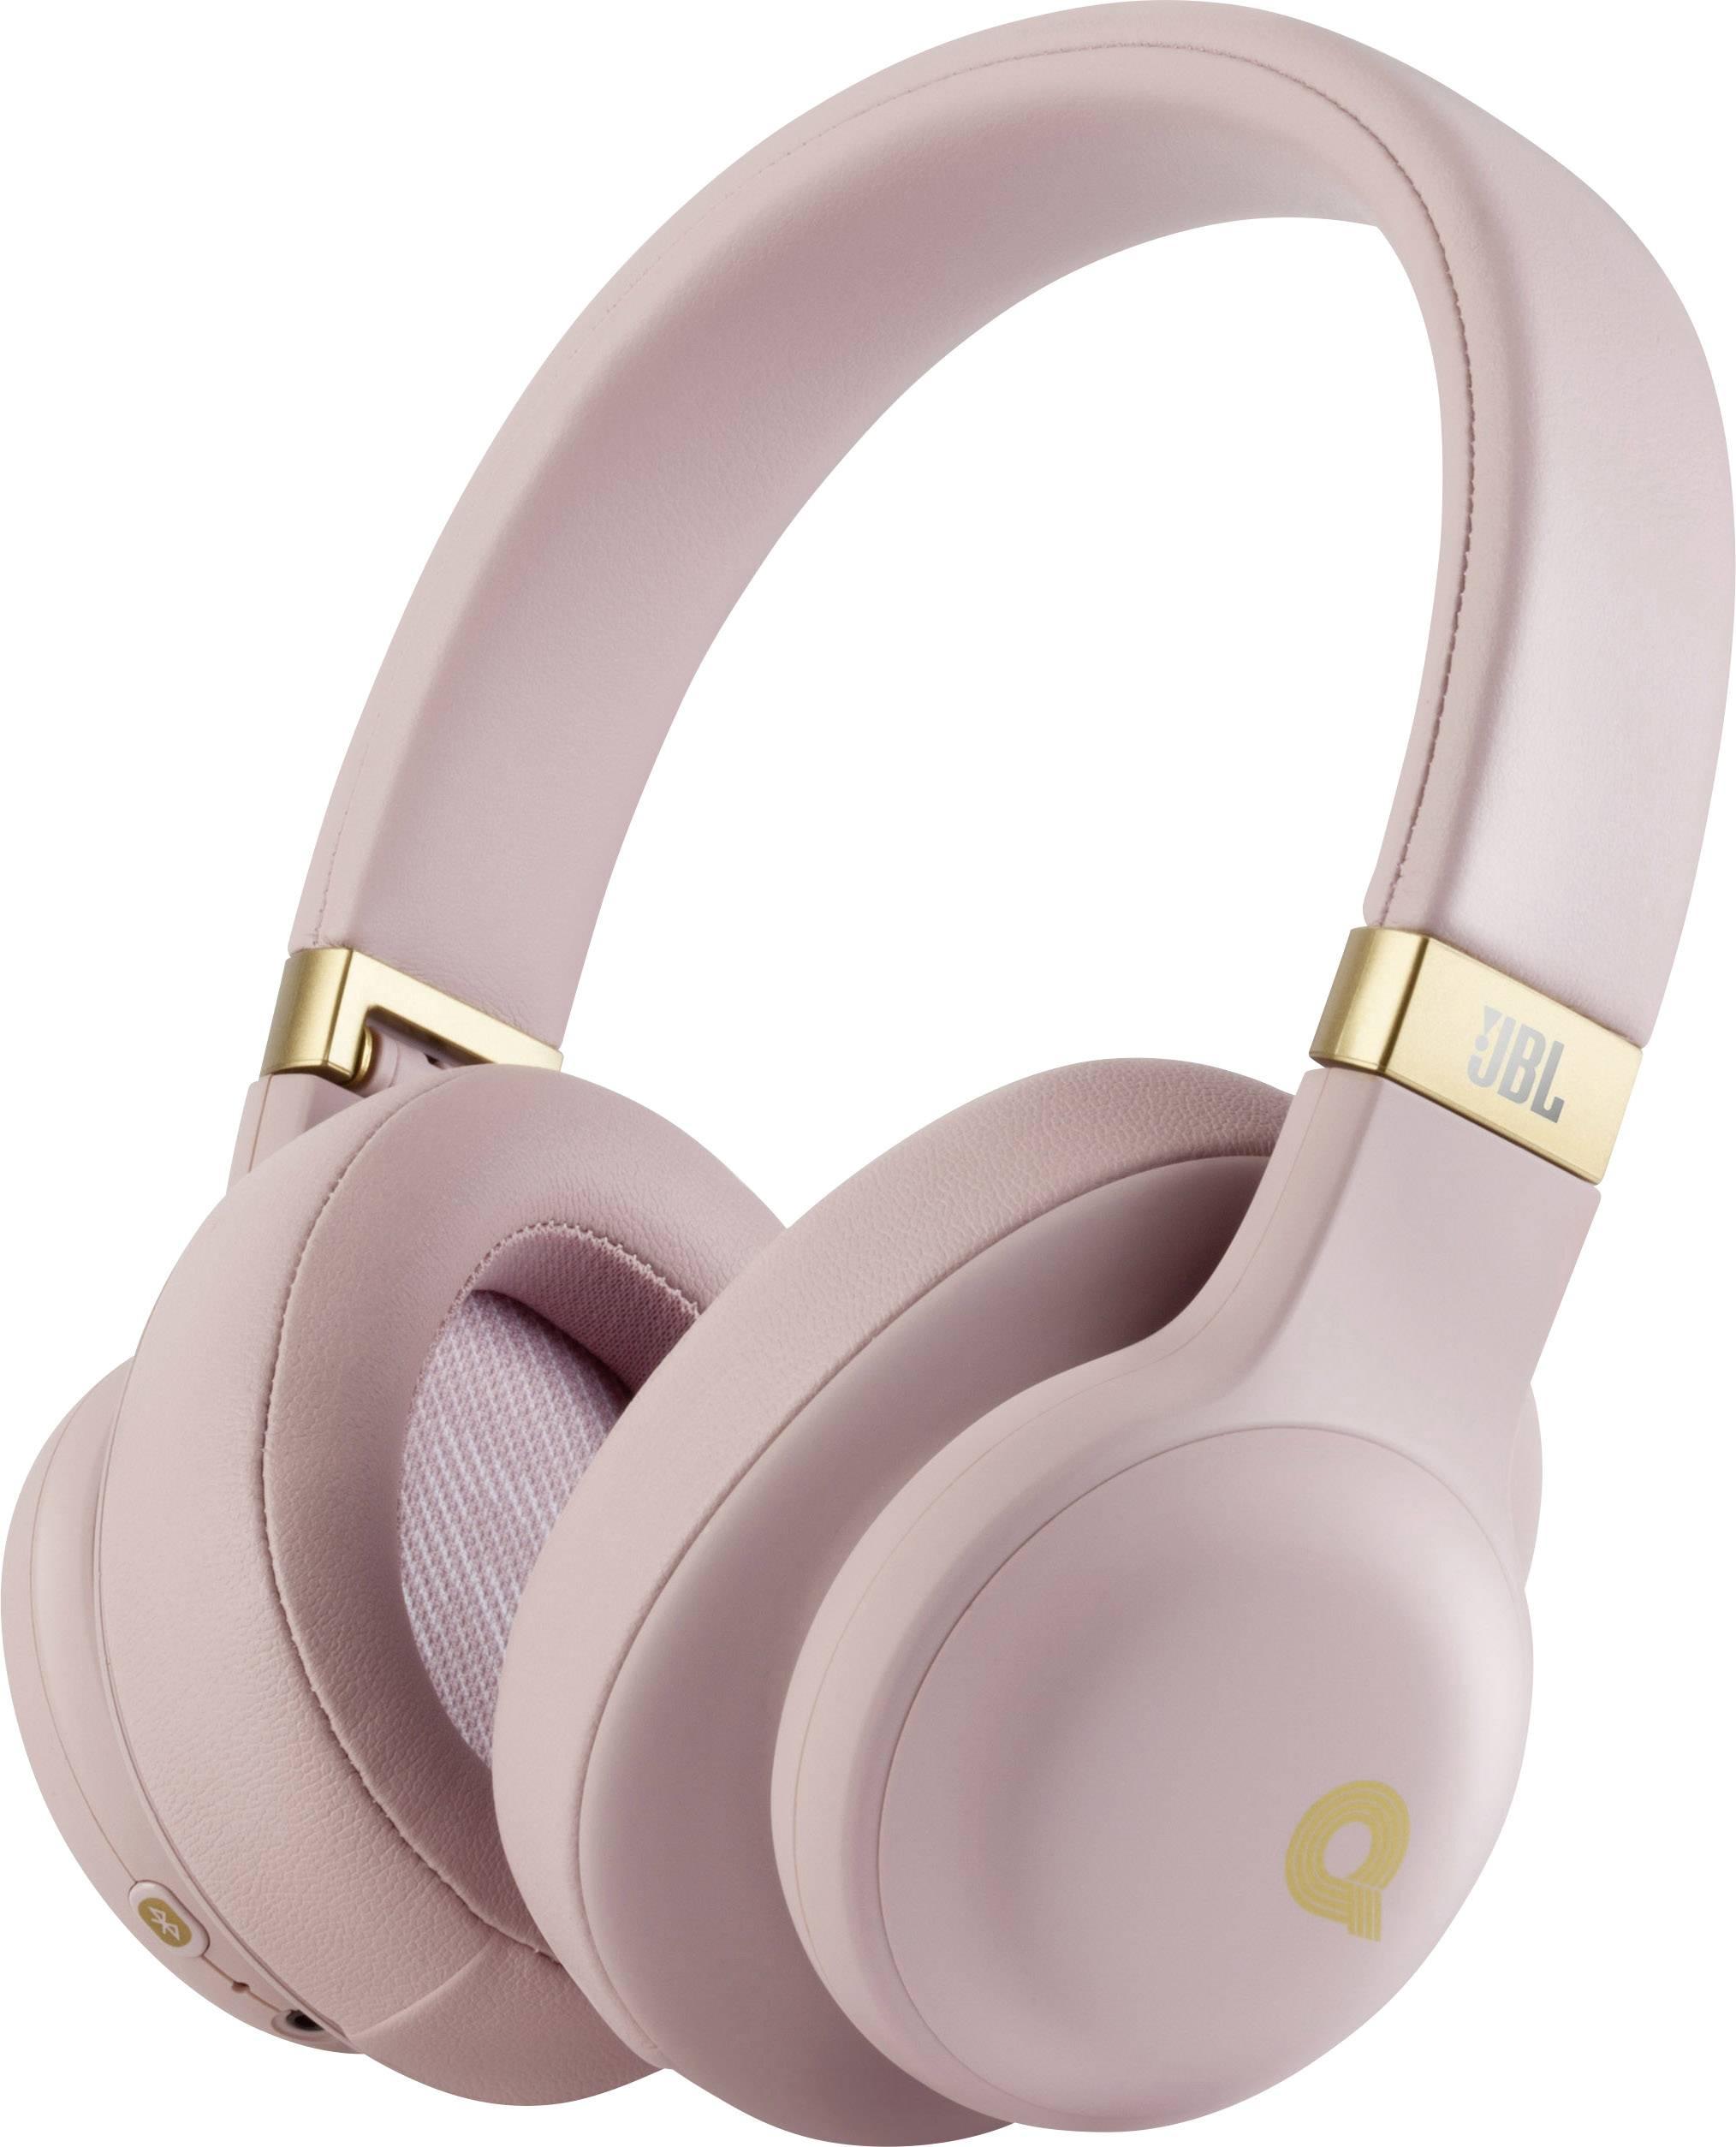 JBL E55BT Bluetooth HiFi Hörlurar   bdc0efdd8ab72